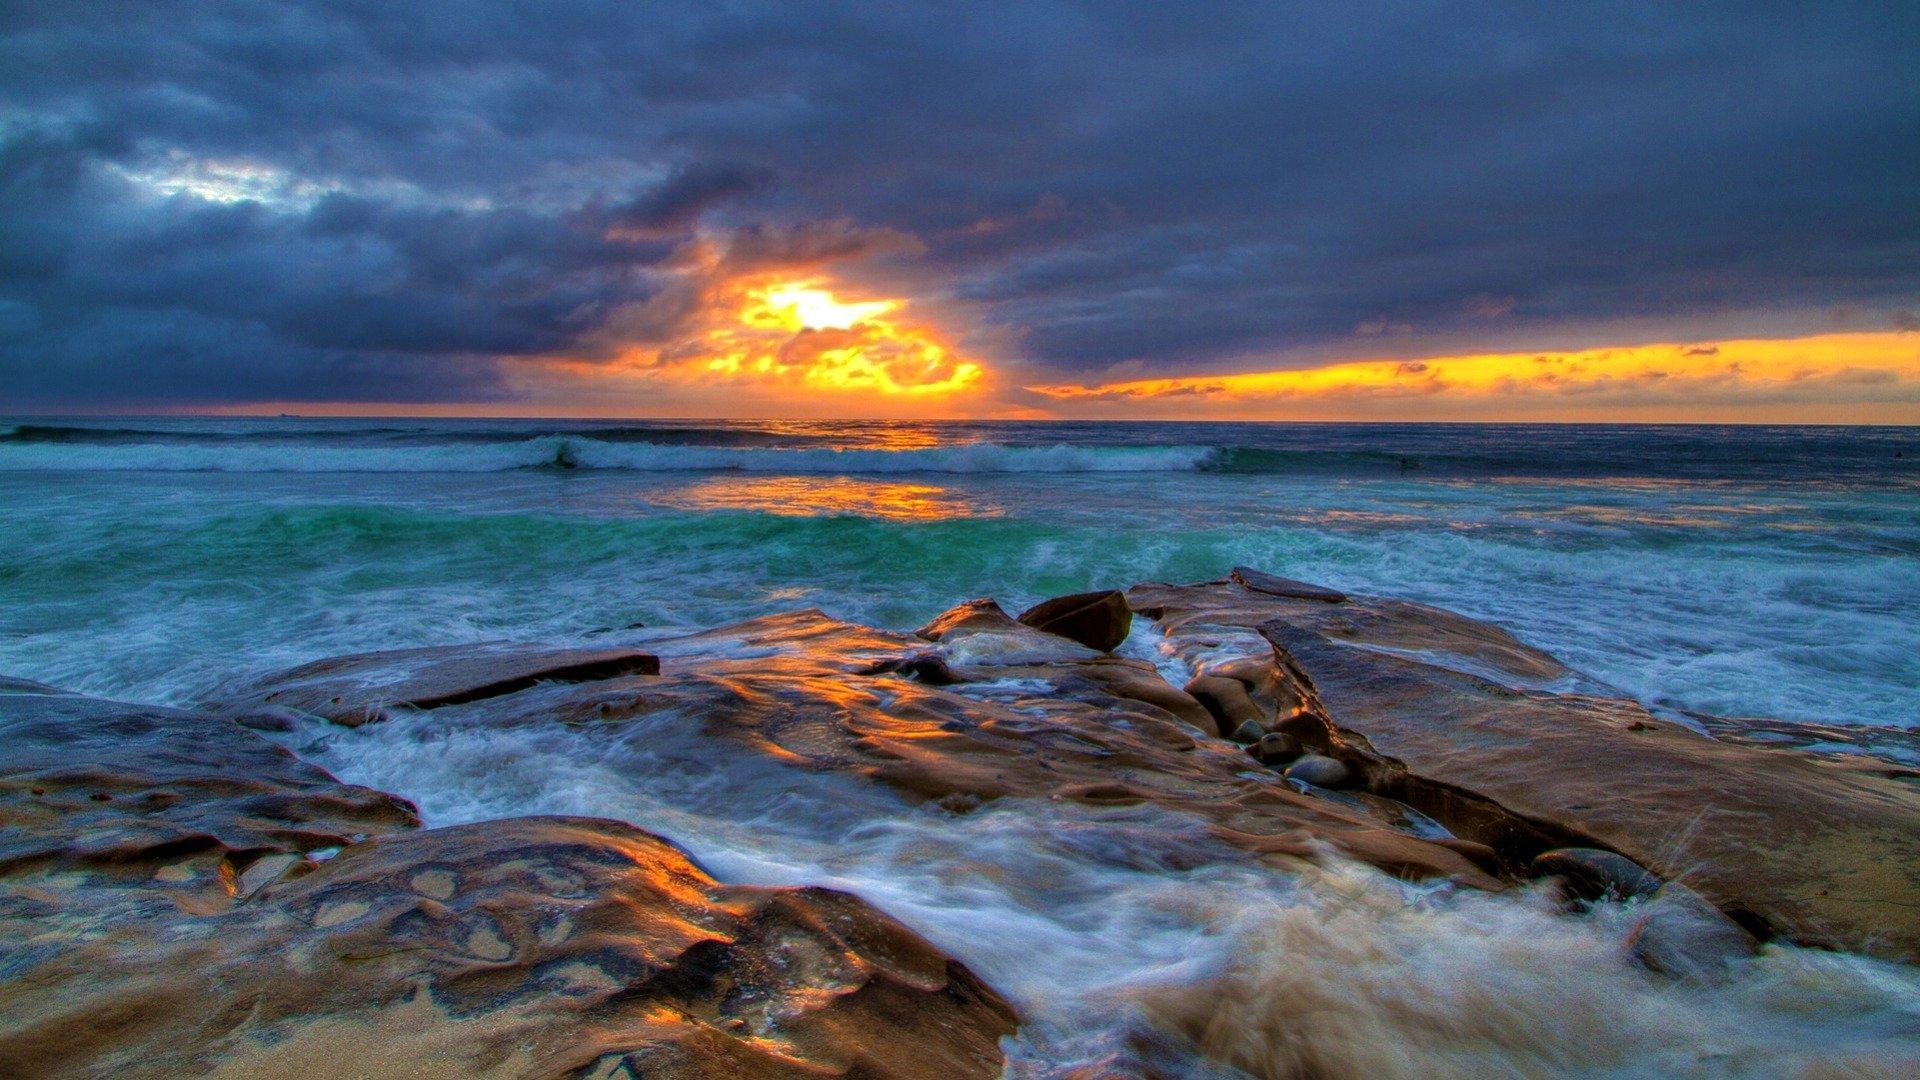 Earth - Ocean  Horizon Earth Turquoise Rock Sky Sunset Cloud Wallpaper